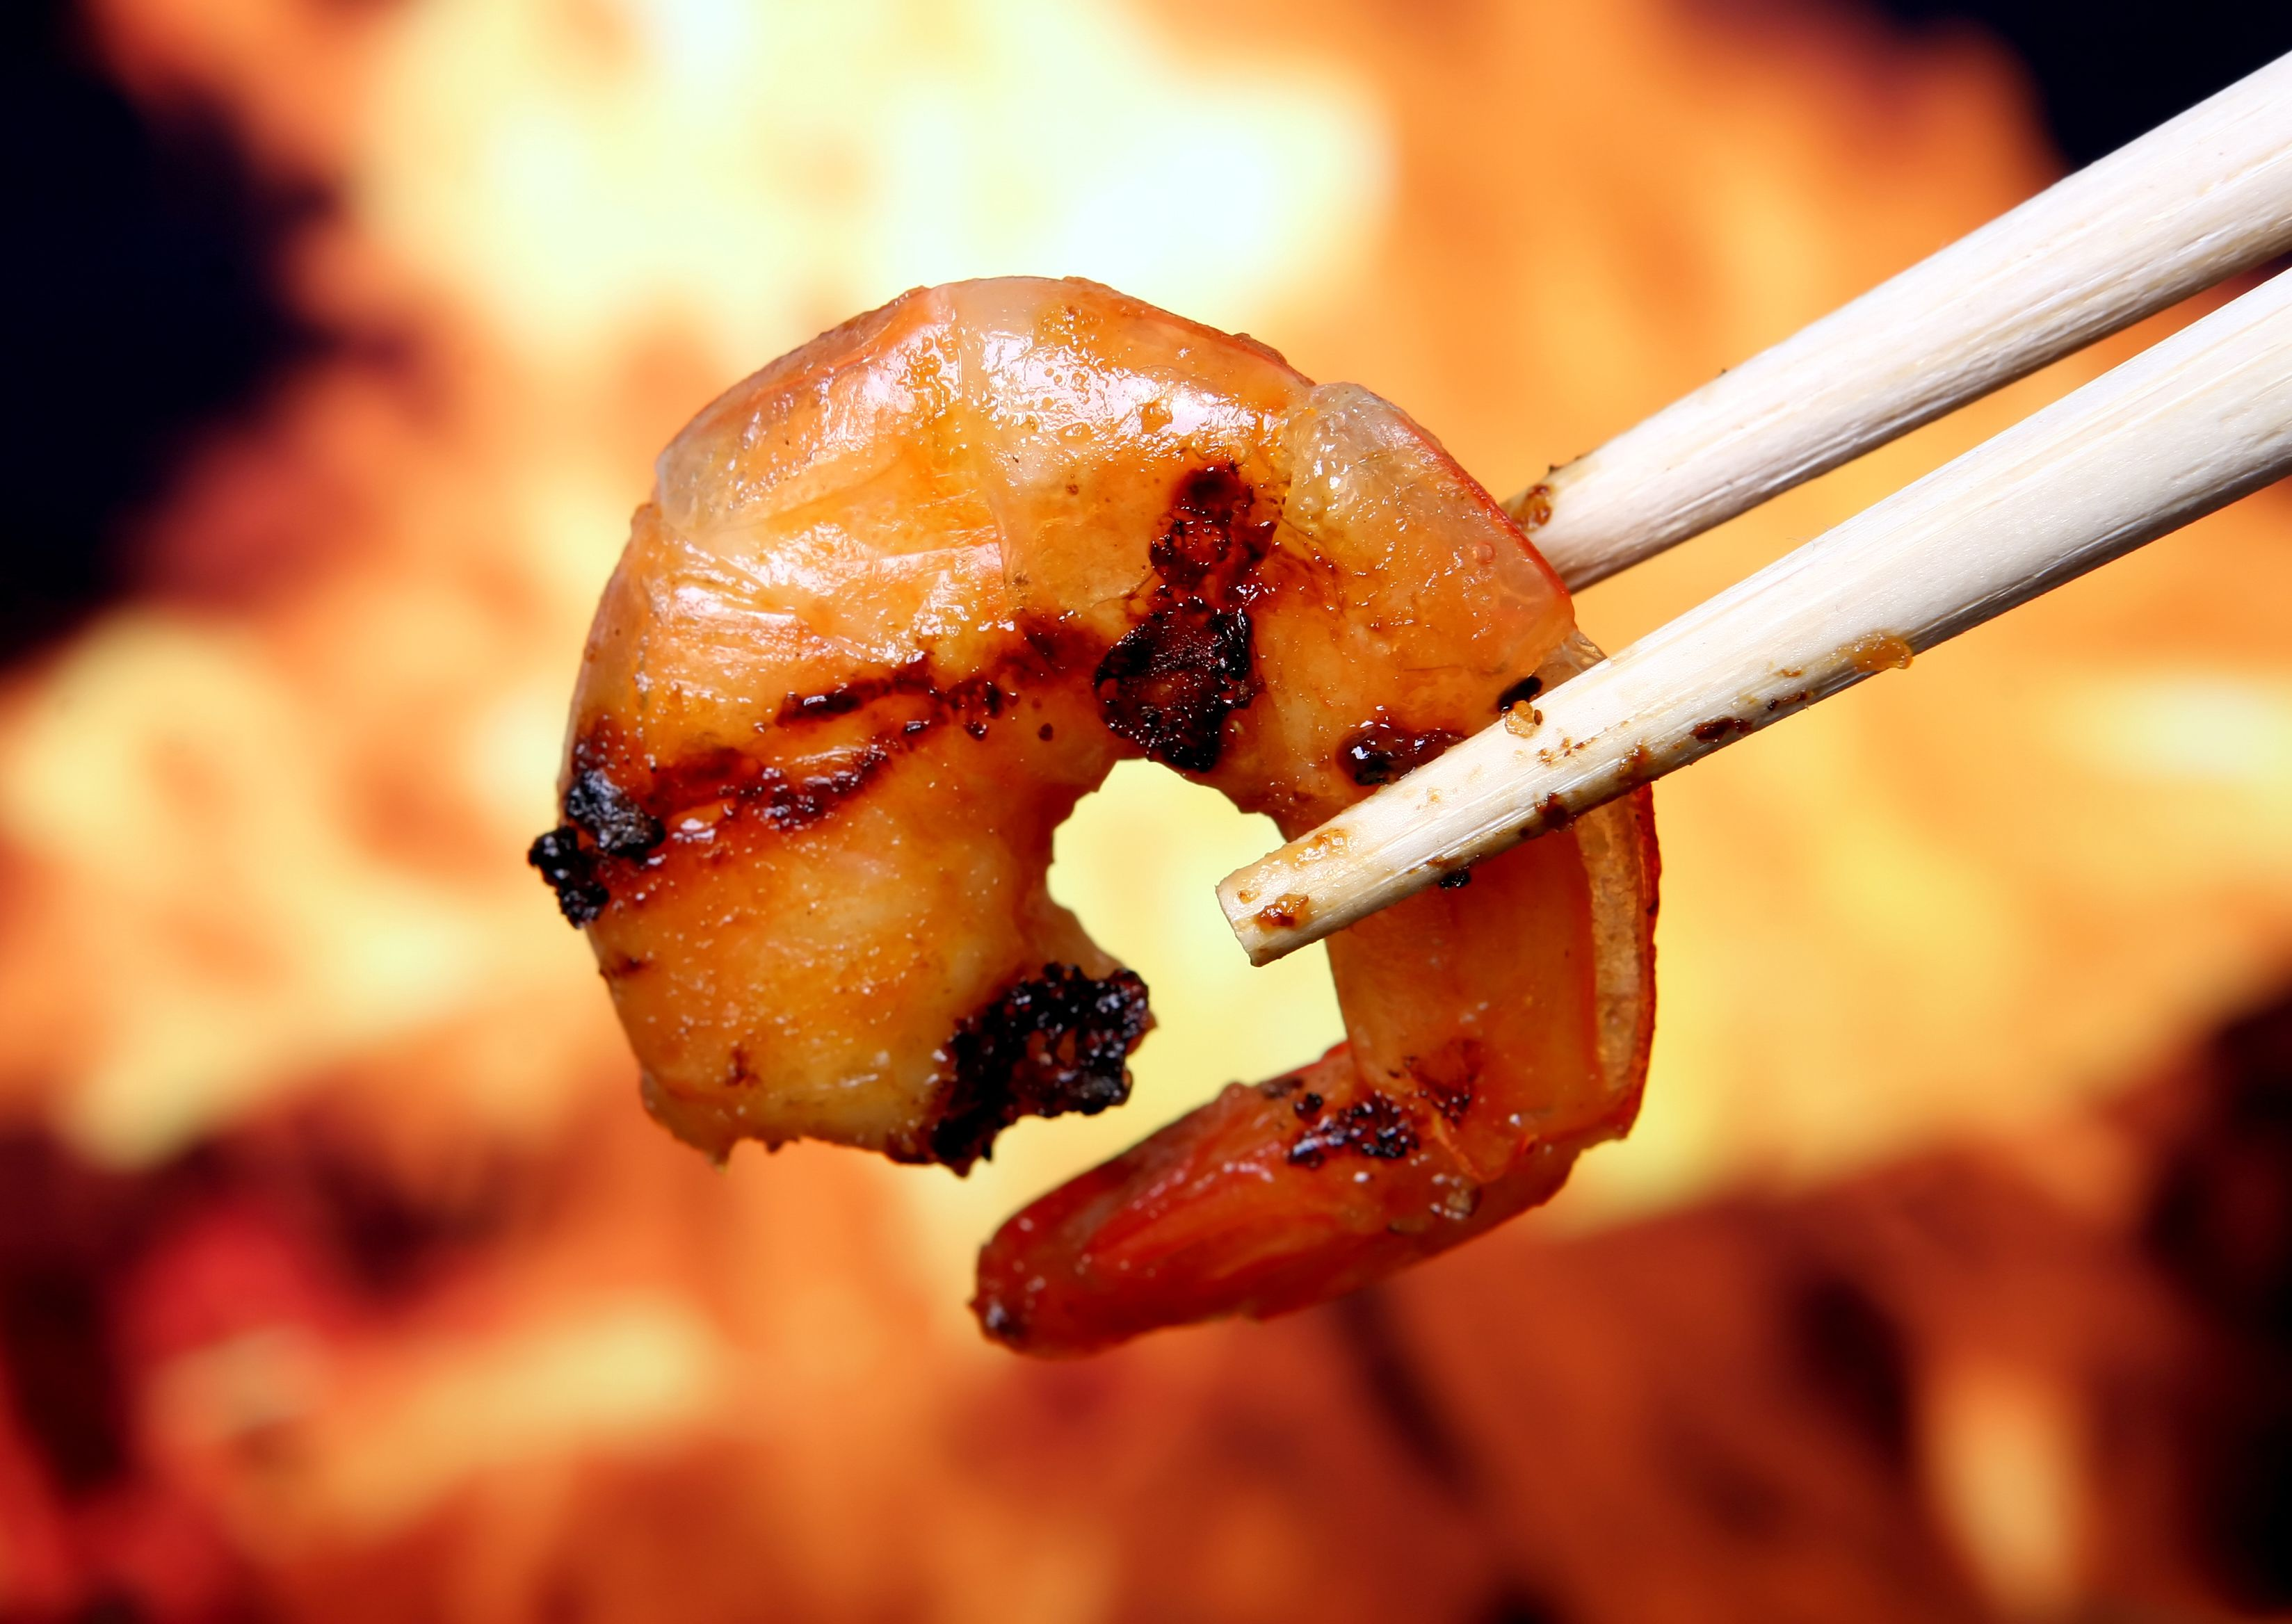 Shrimp with green tea leaves recipe